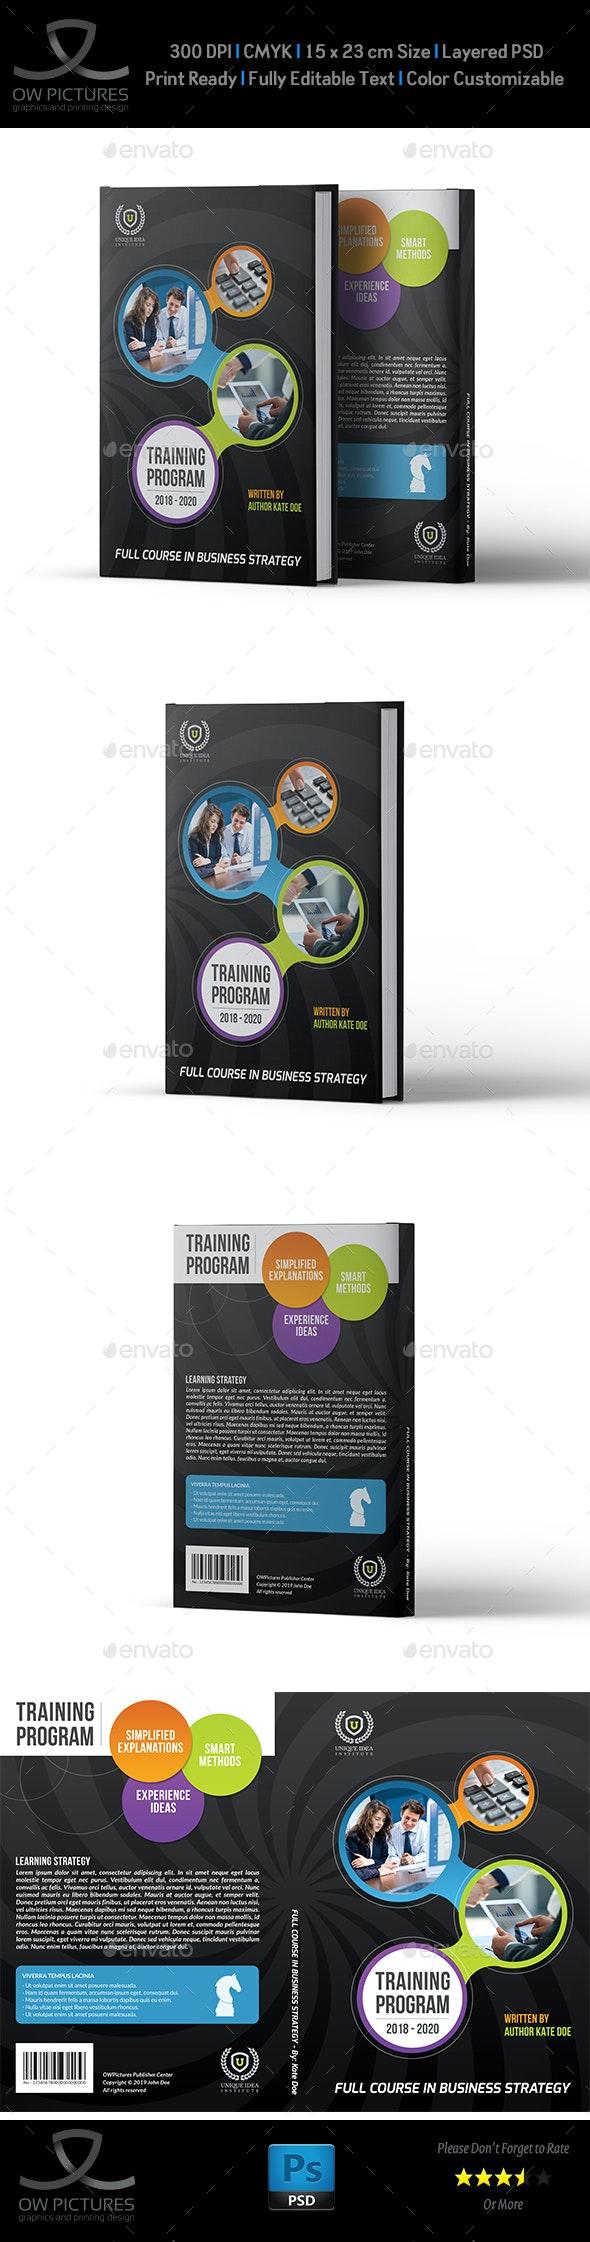 Book Cover Template Vol.2 - Miscellaneous Print Templates